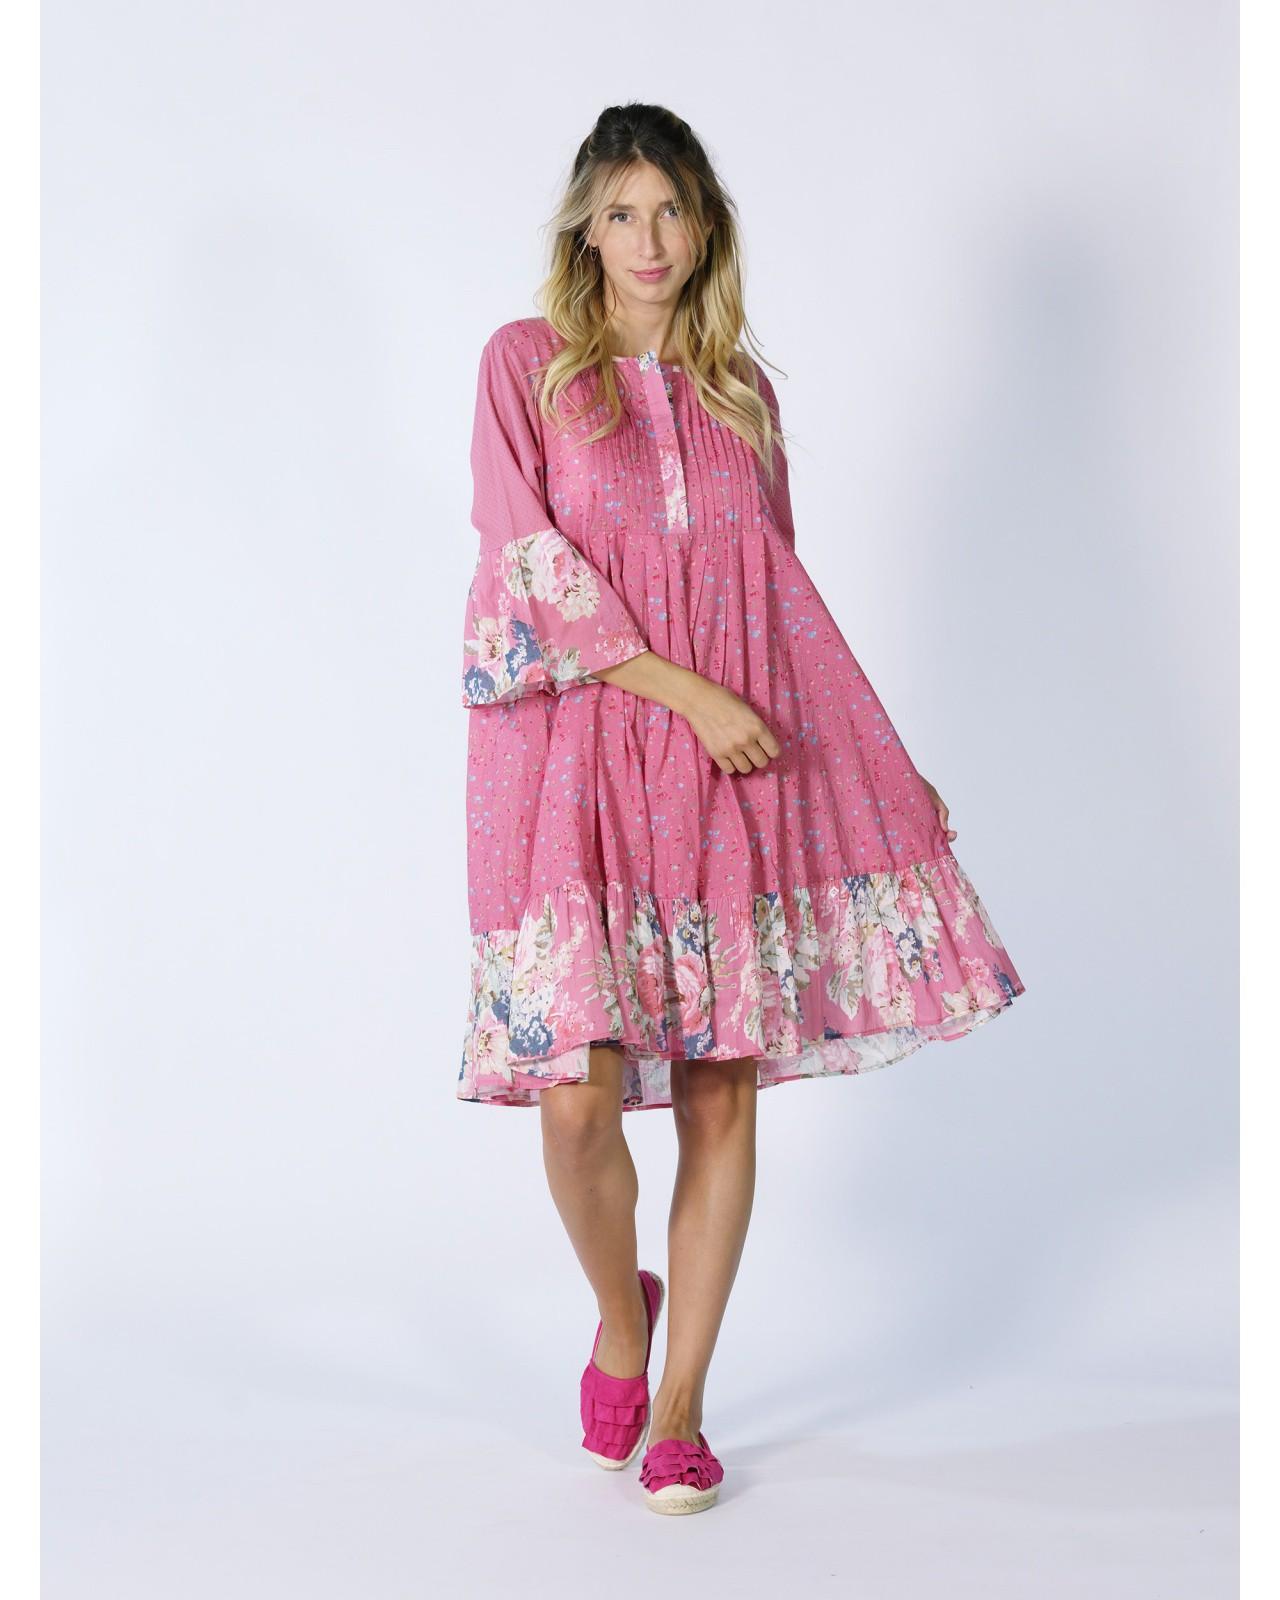 Robe ample Rhum Raisin, Valensole 65